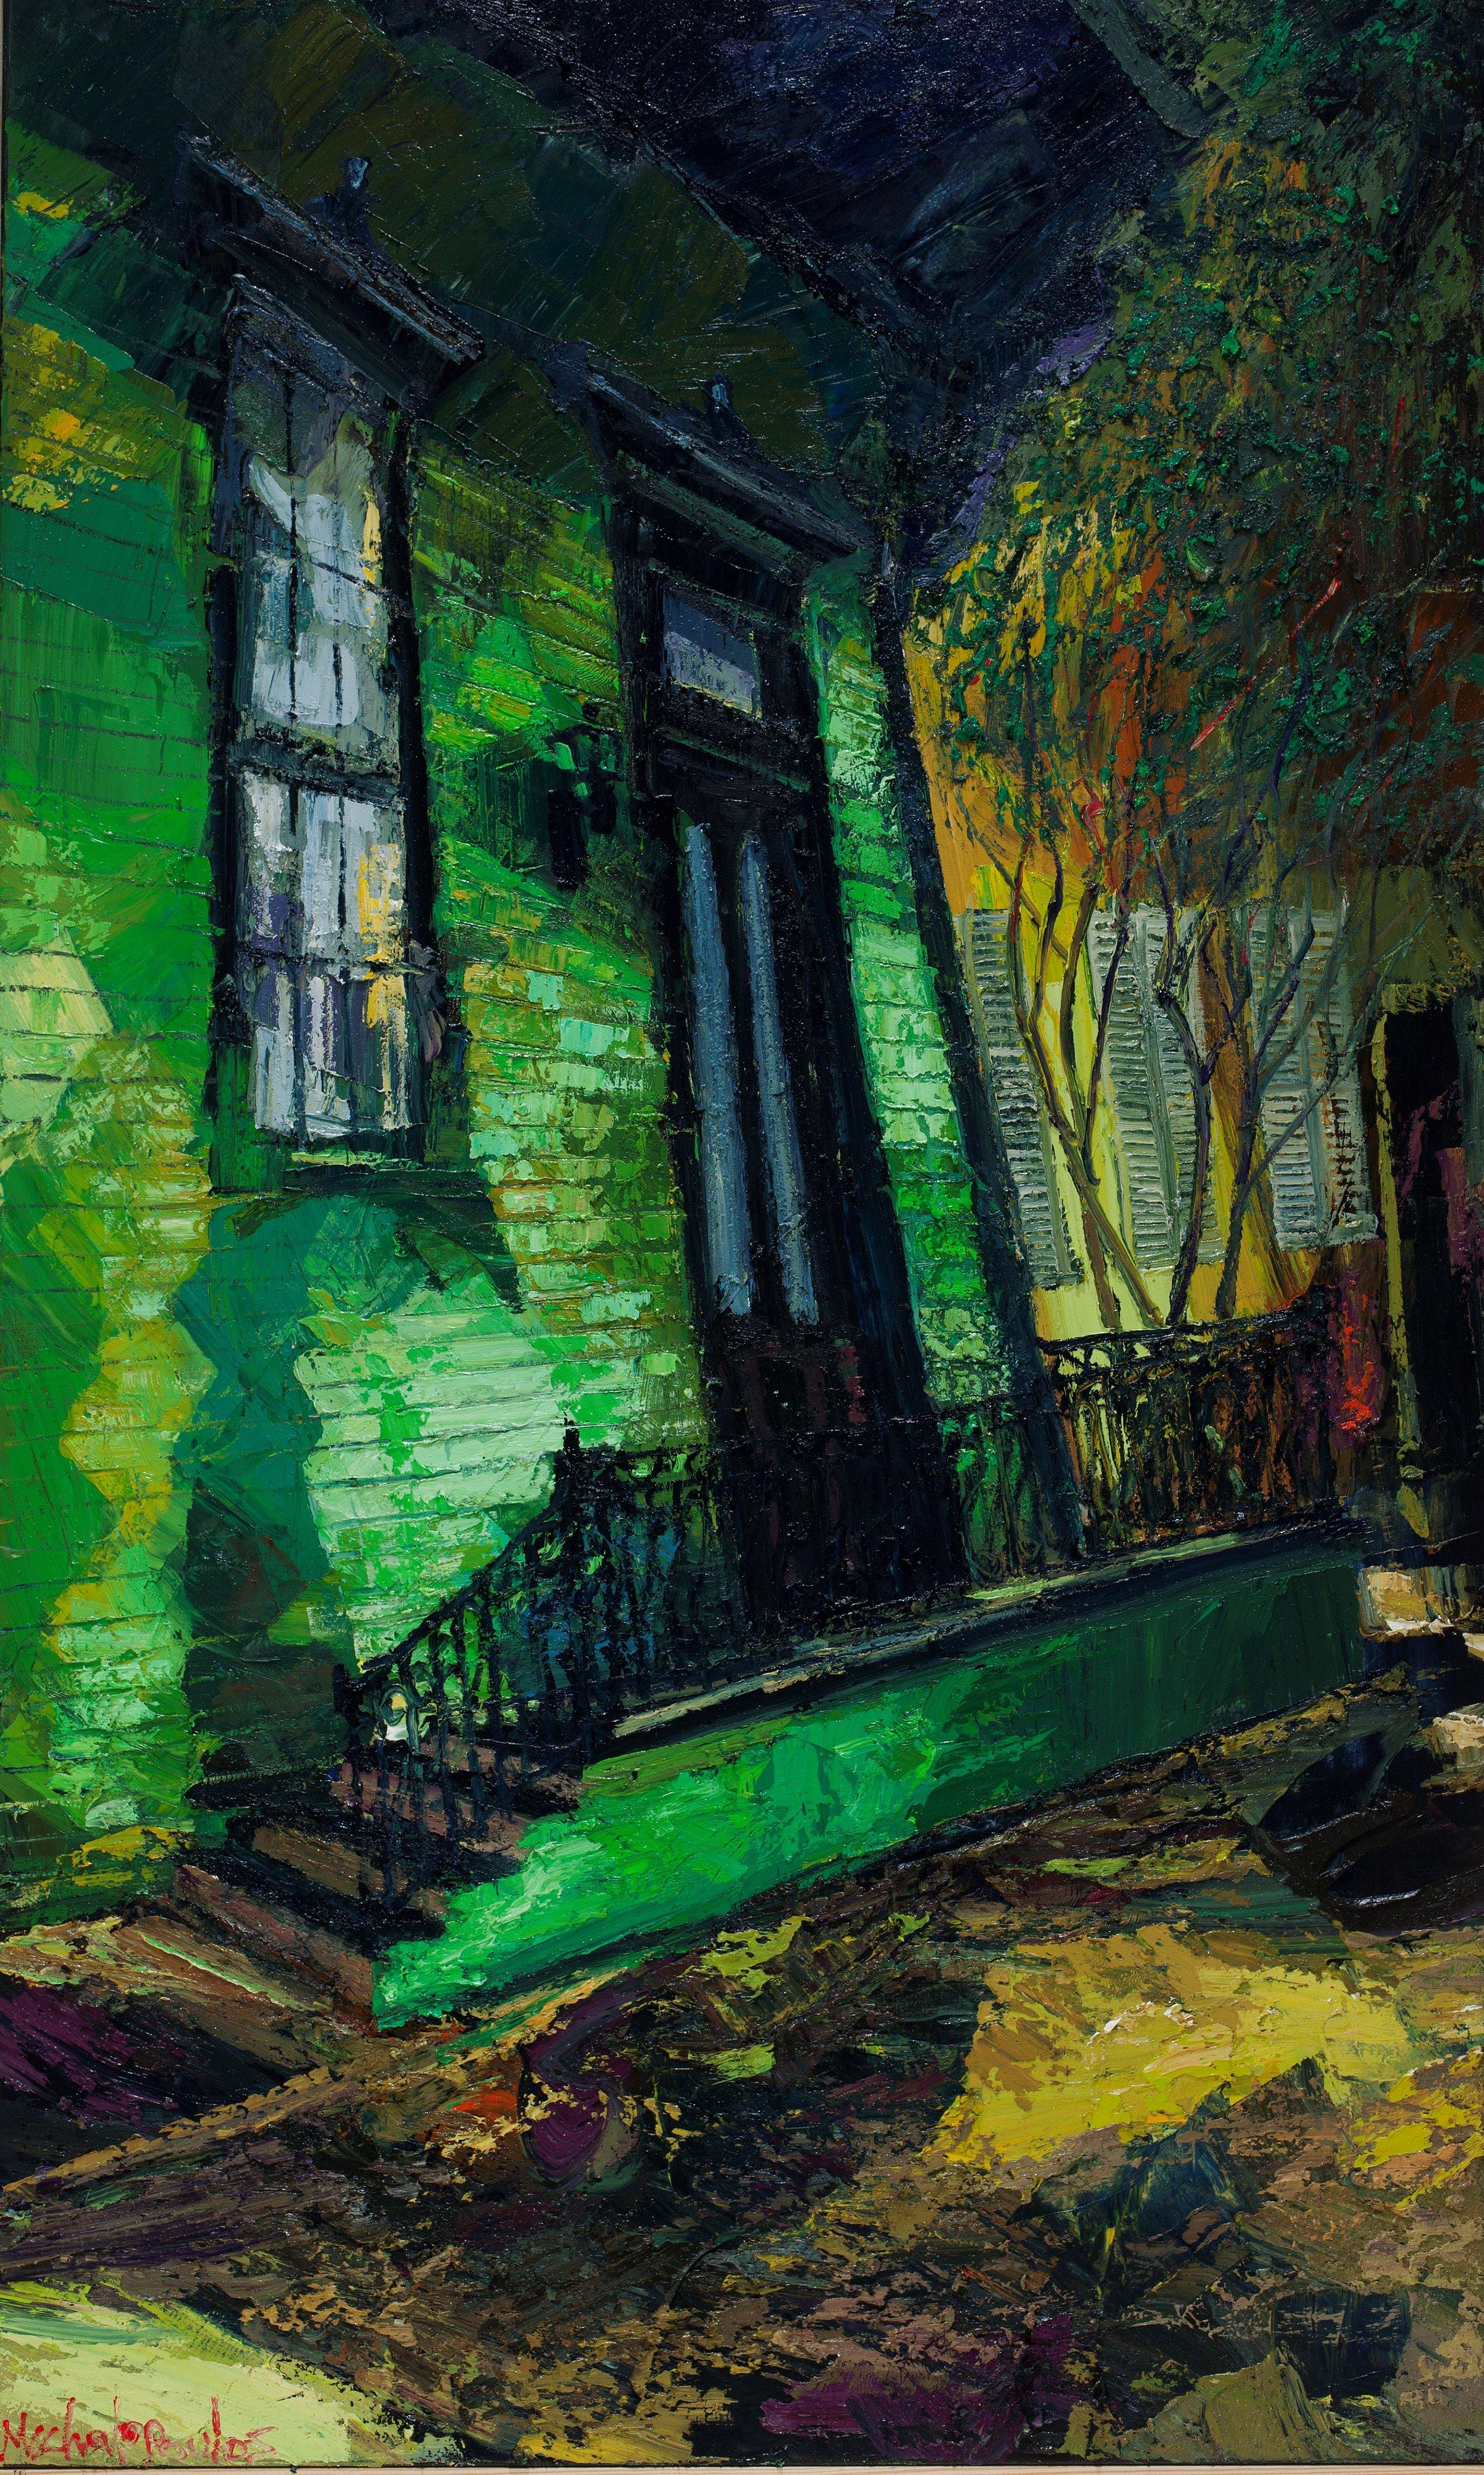 C302 Green Lantern 60 x 36.jpg